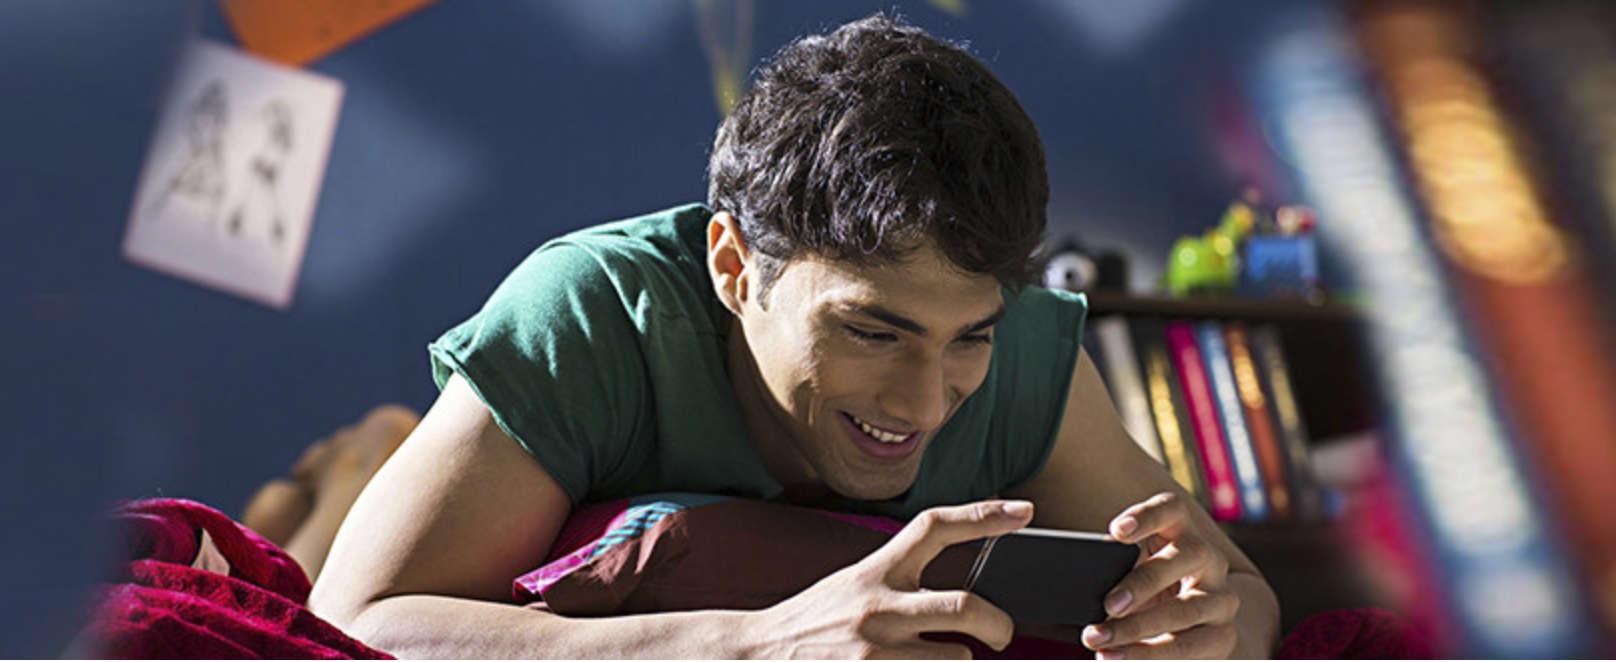 Robi WiFi : High Speed WiFi Internet